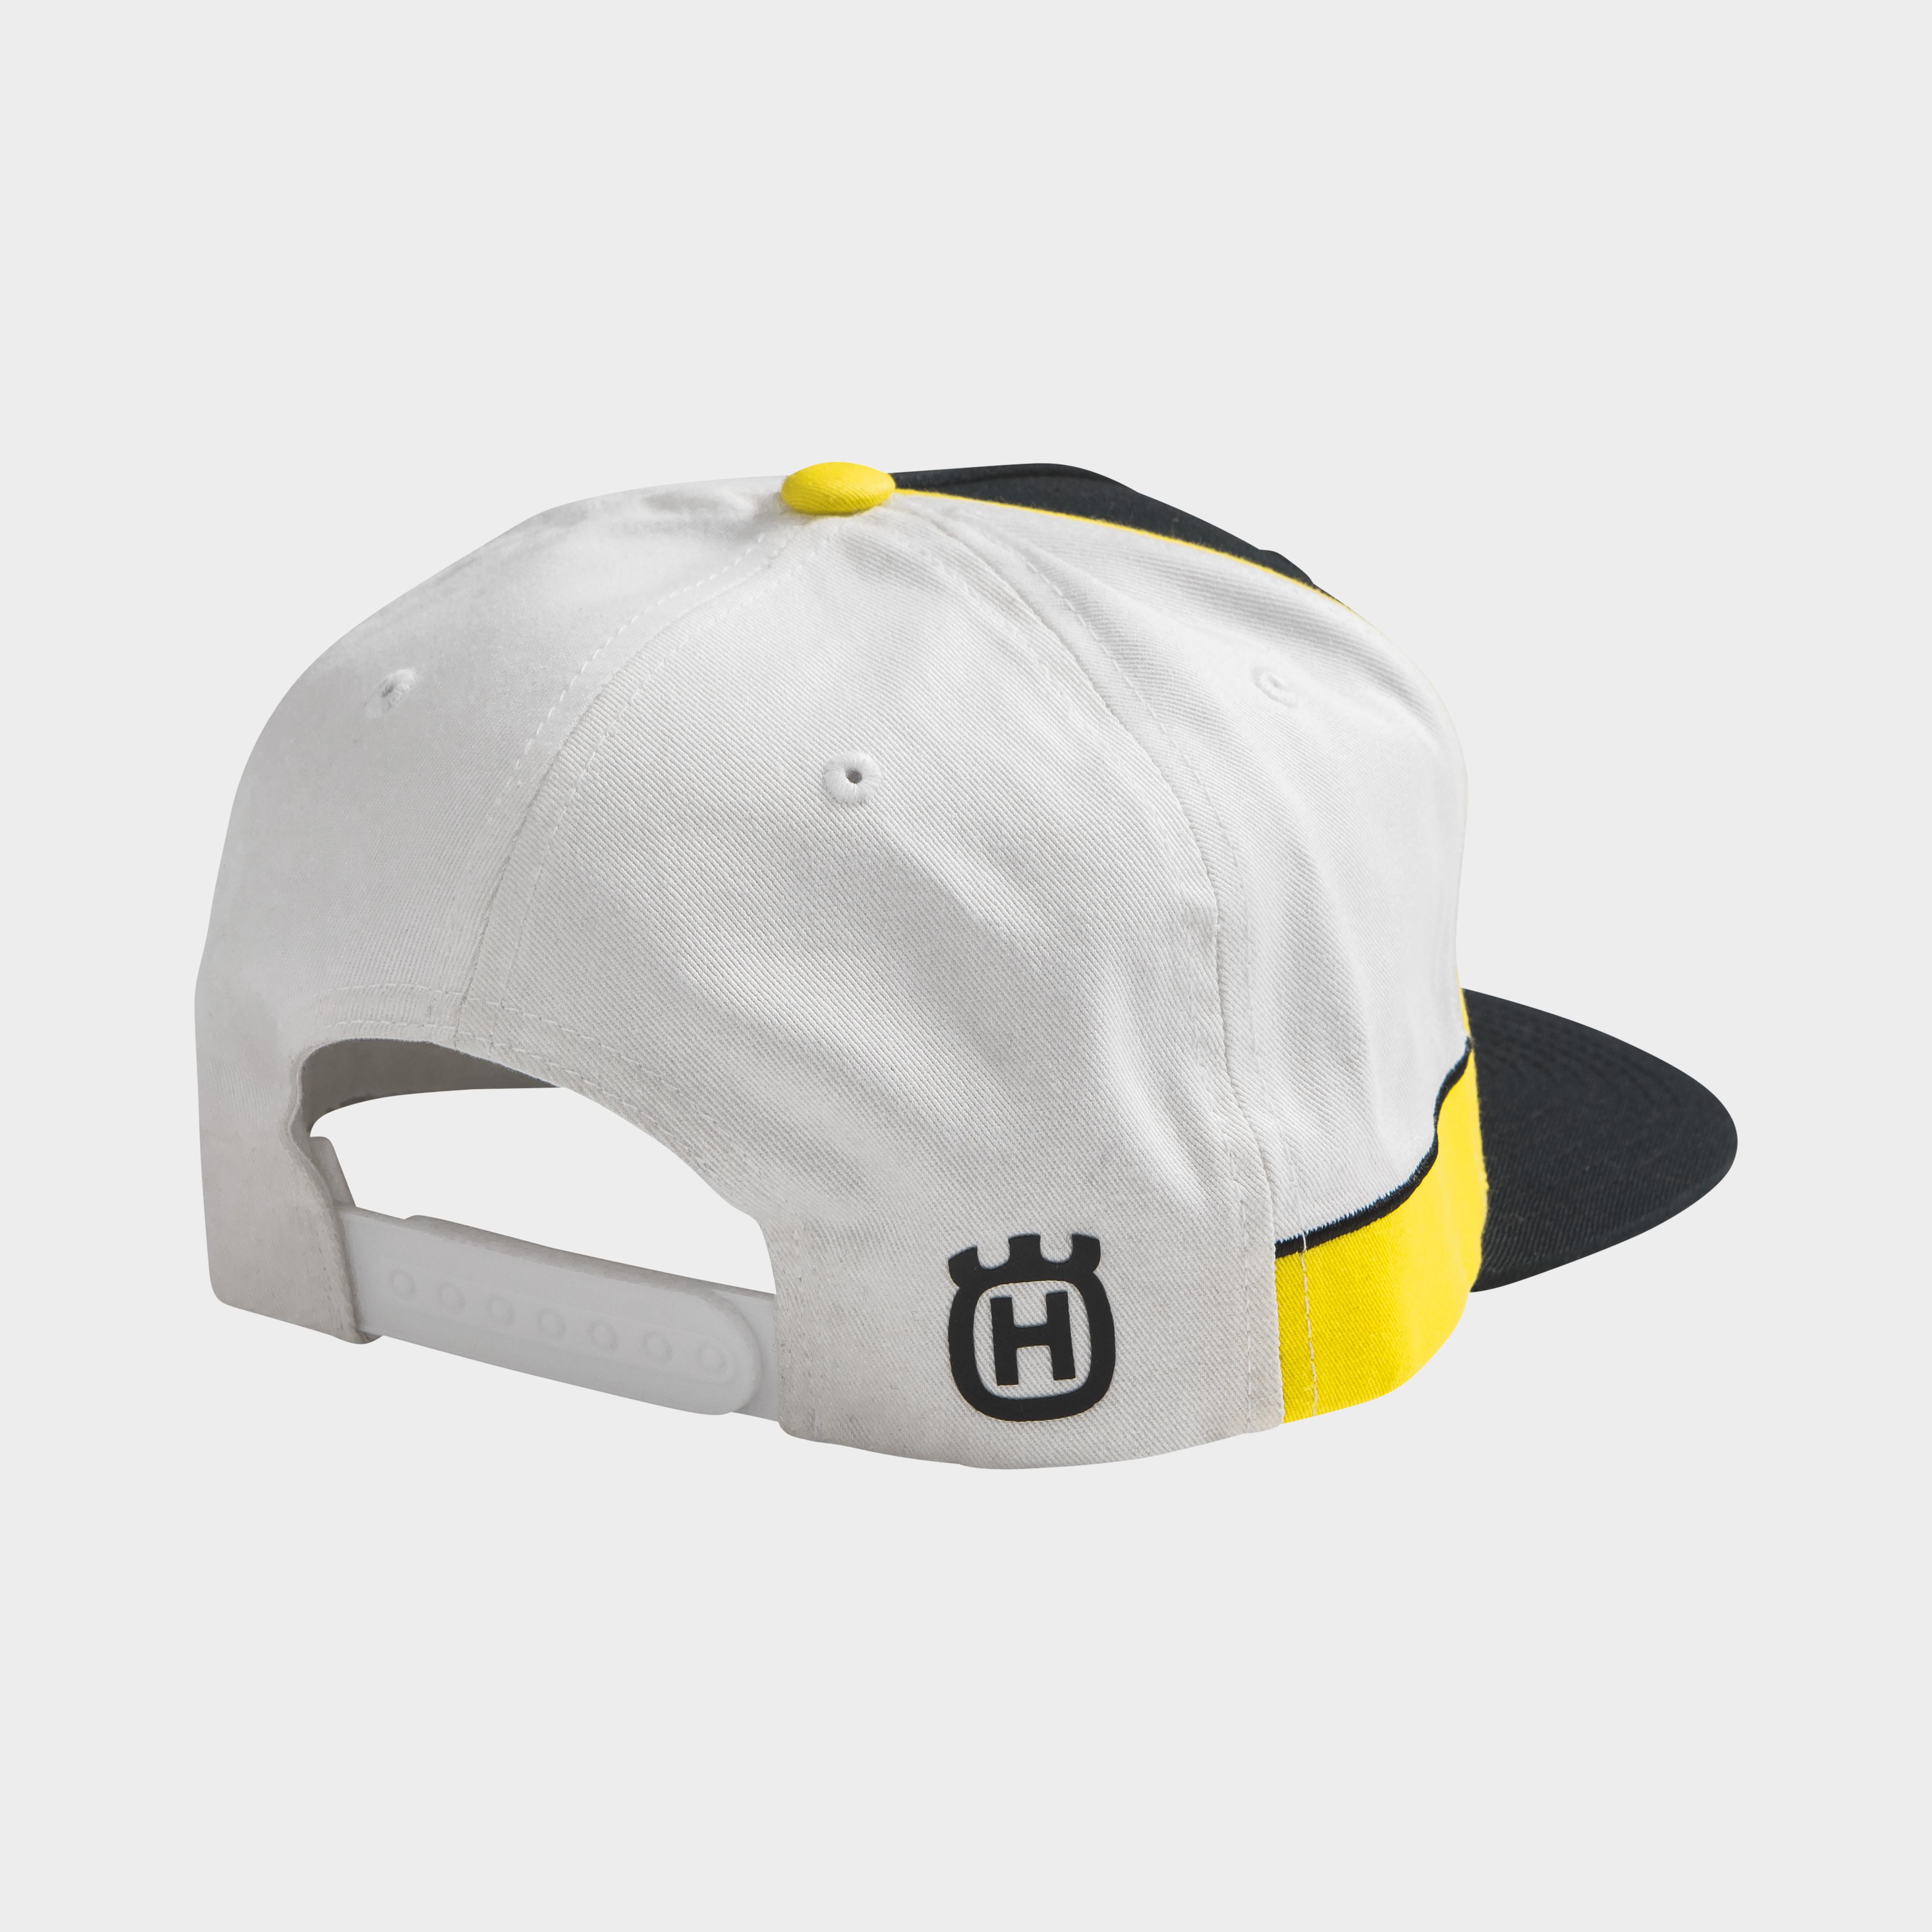 Rockstar Energy Husqvarna Factory Racing Replica Collection Snapback cap